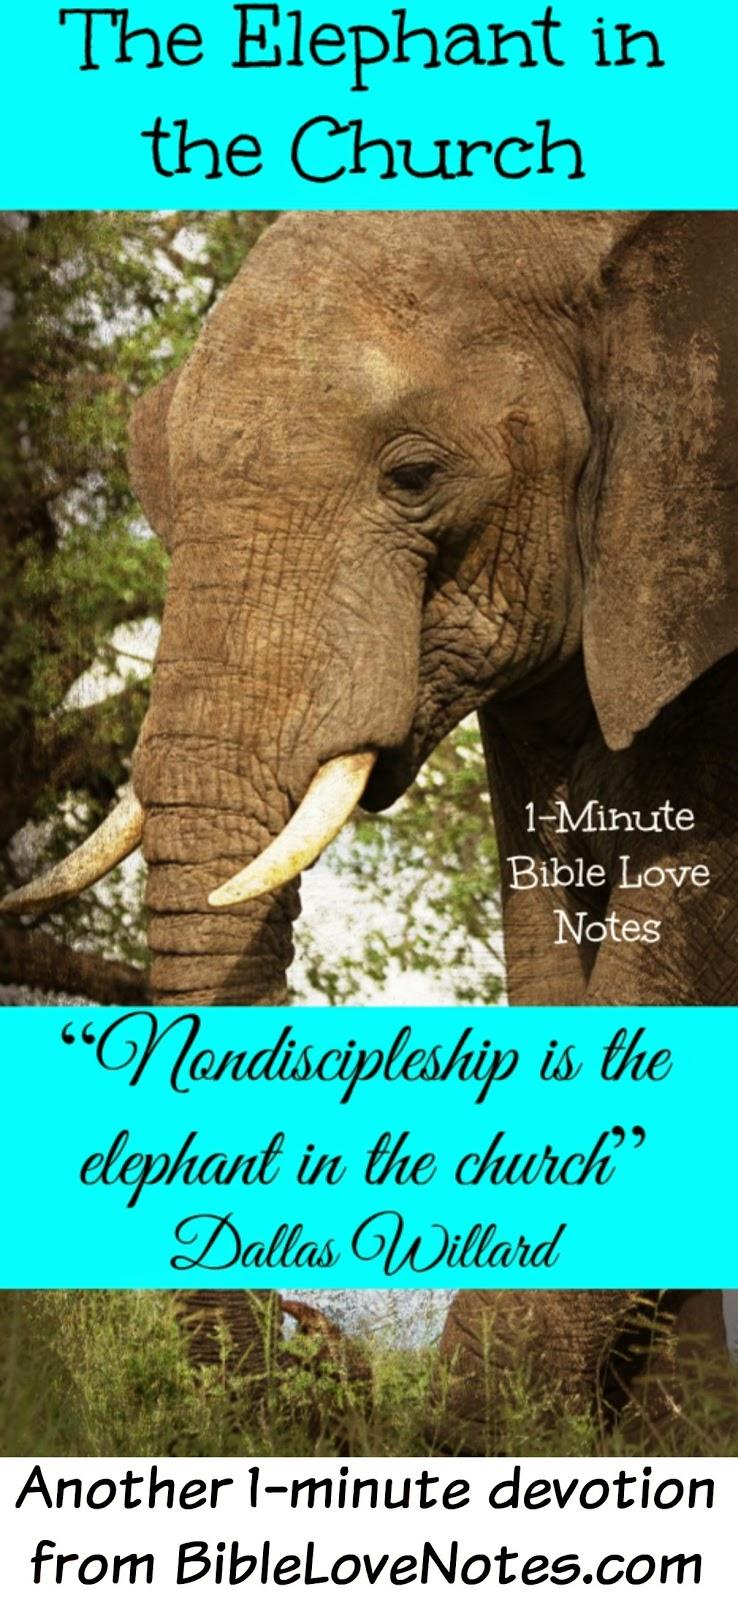 Non-discipleship, Christian growth